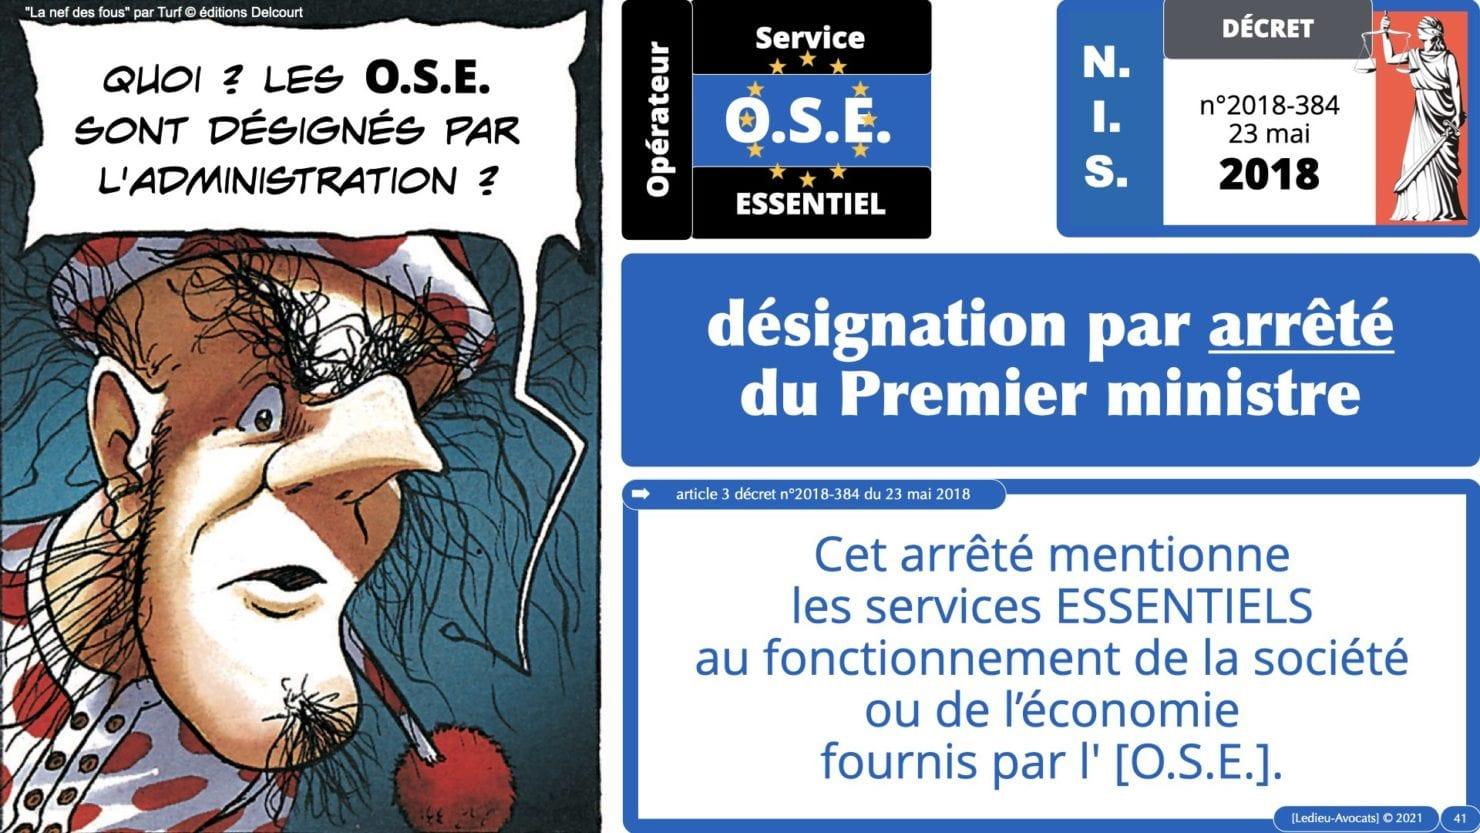 337 cyber sécurité #1 OIV OSE Critical Entities © Ledieu-avocat 15-06-2021.041